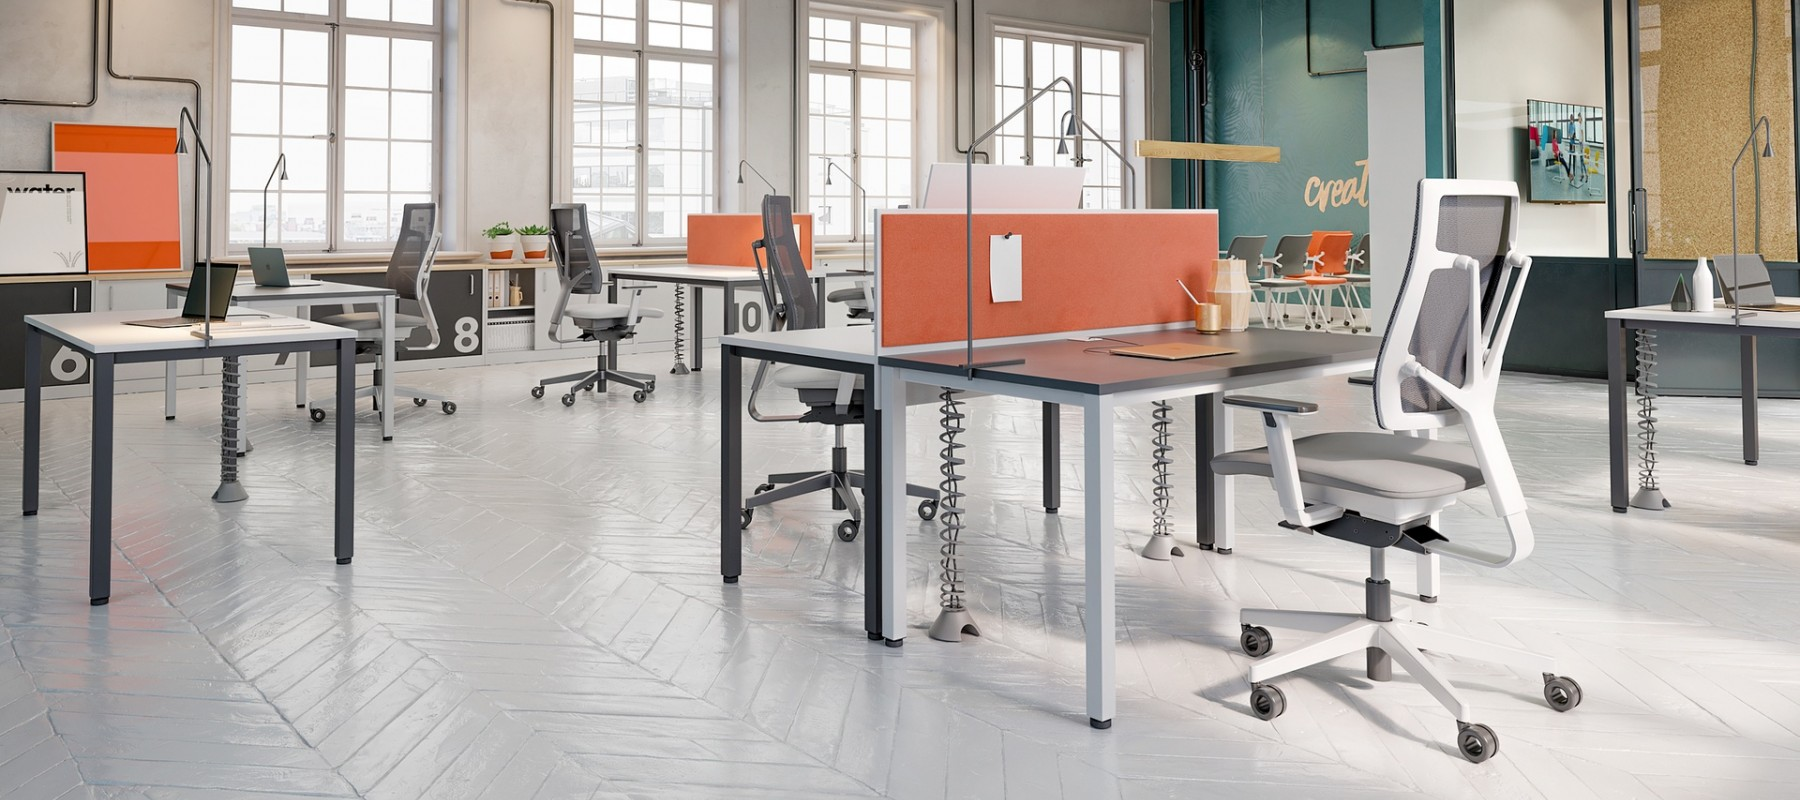 fotele-krzesla-siedziska-4me-2me-aranzacje09